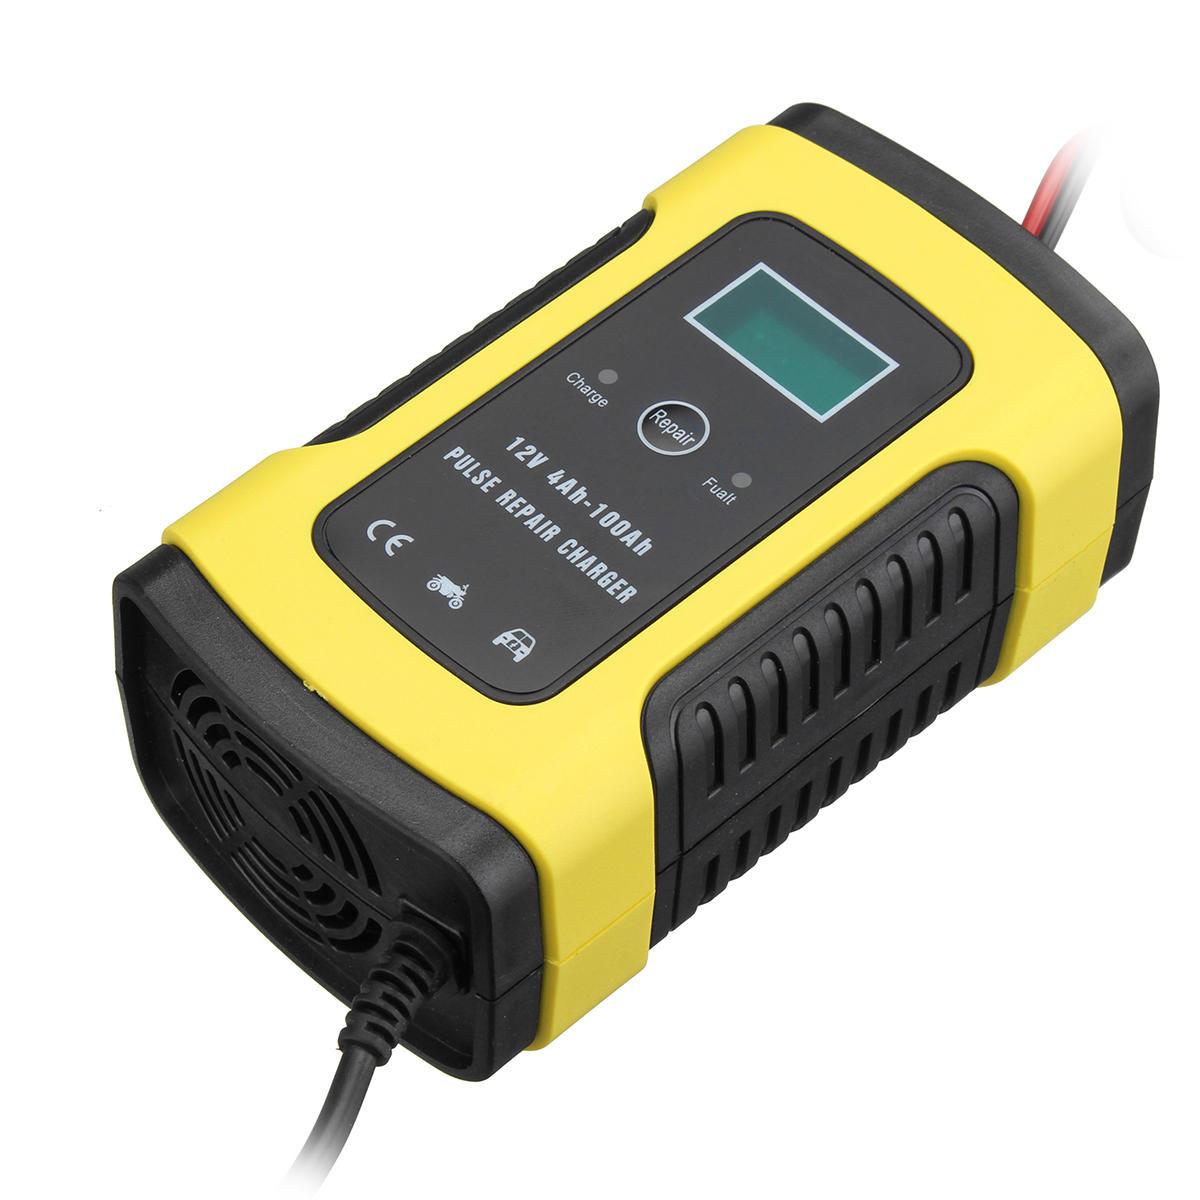 12V - Batterieladegerät (KFZ/Motorrad) mit Euro-Stecker + CE für unter 10€